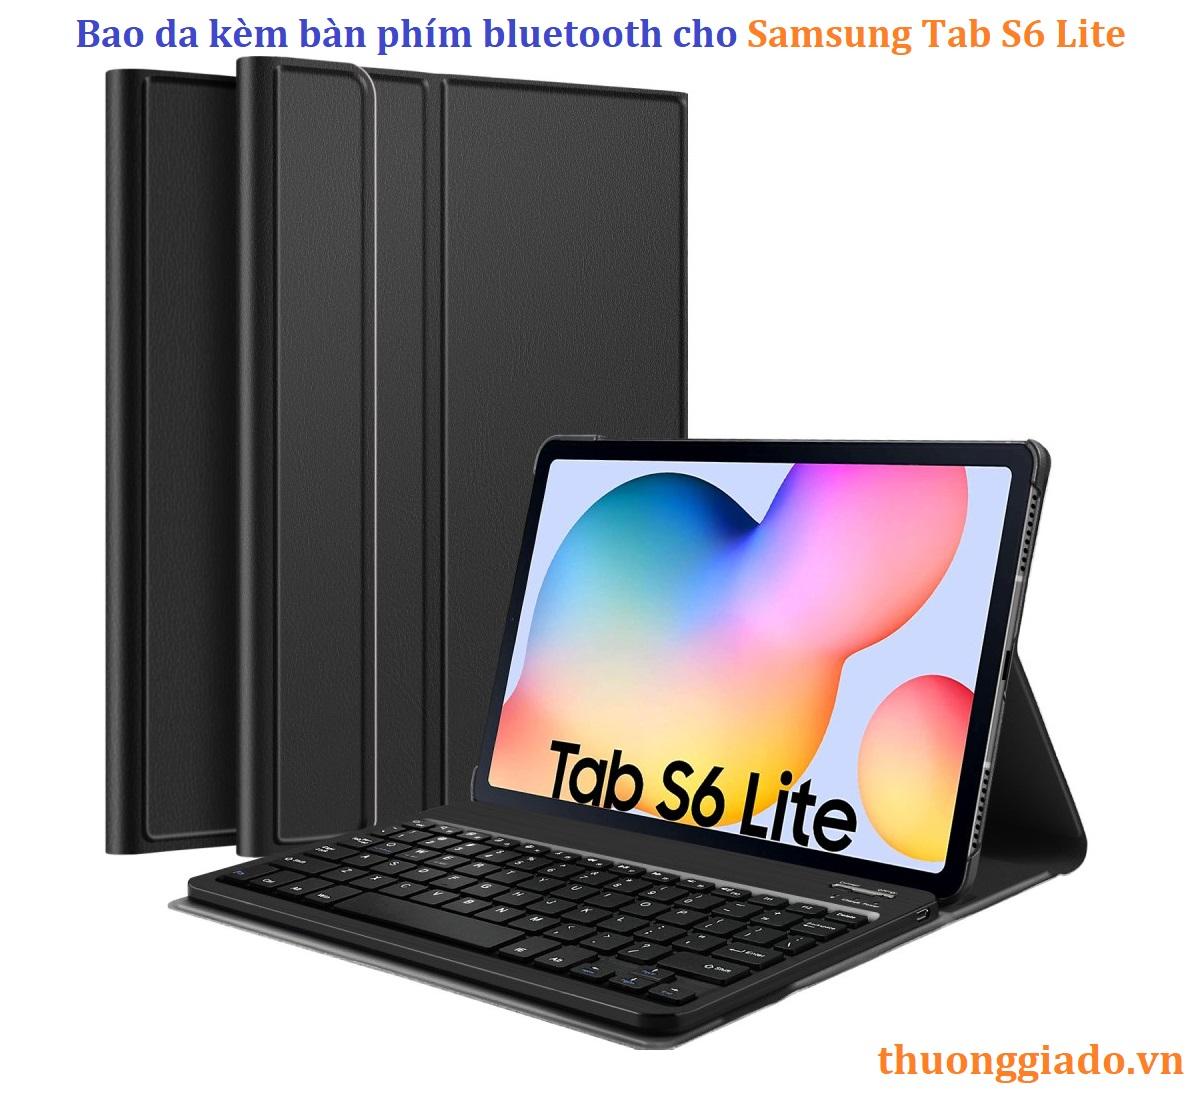 Samsung Galaxy Tab S6 Lite - Bao da kèm bàn phím bluetooth